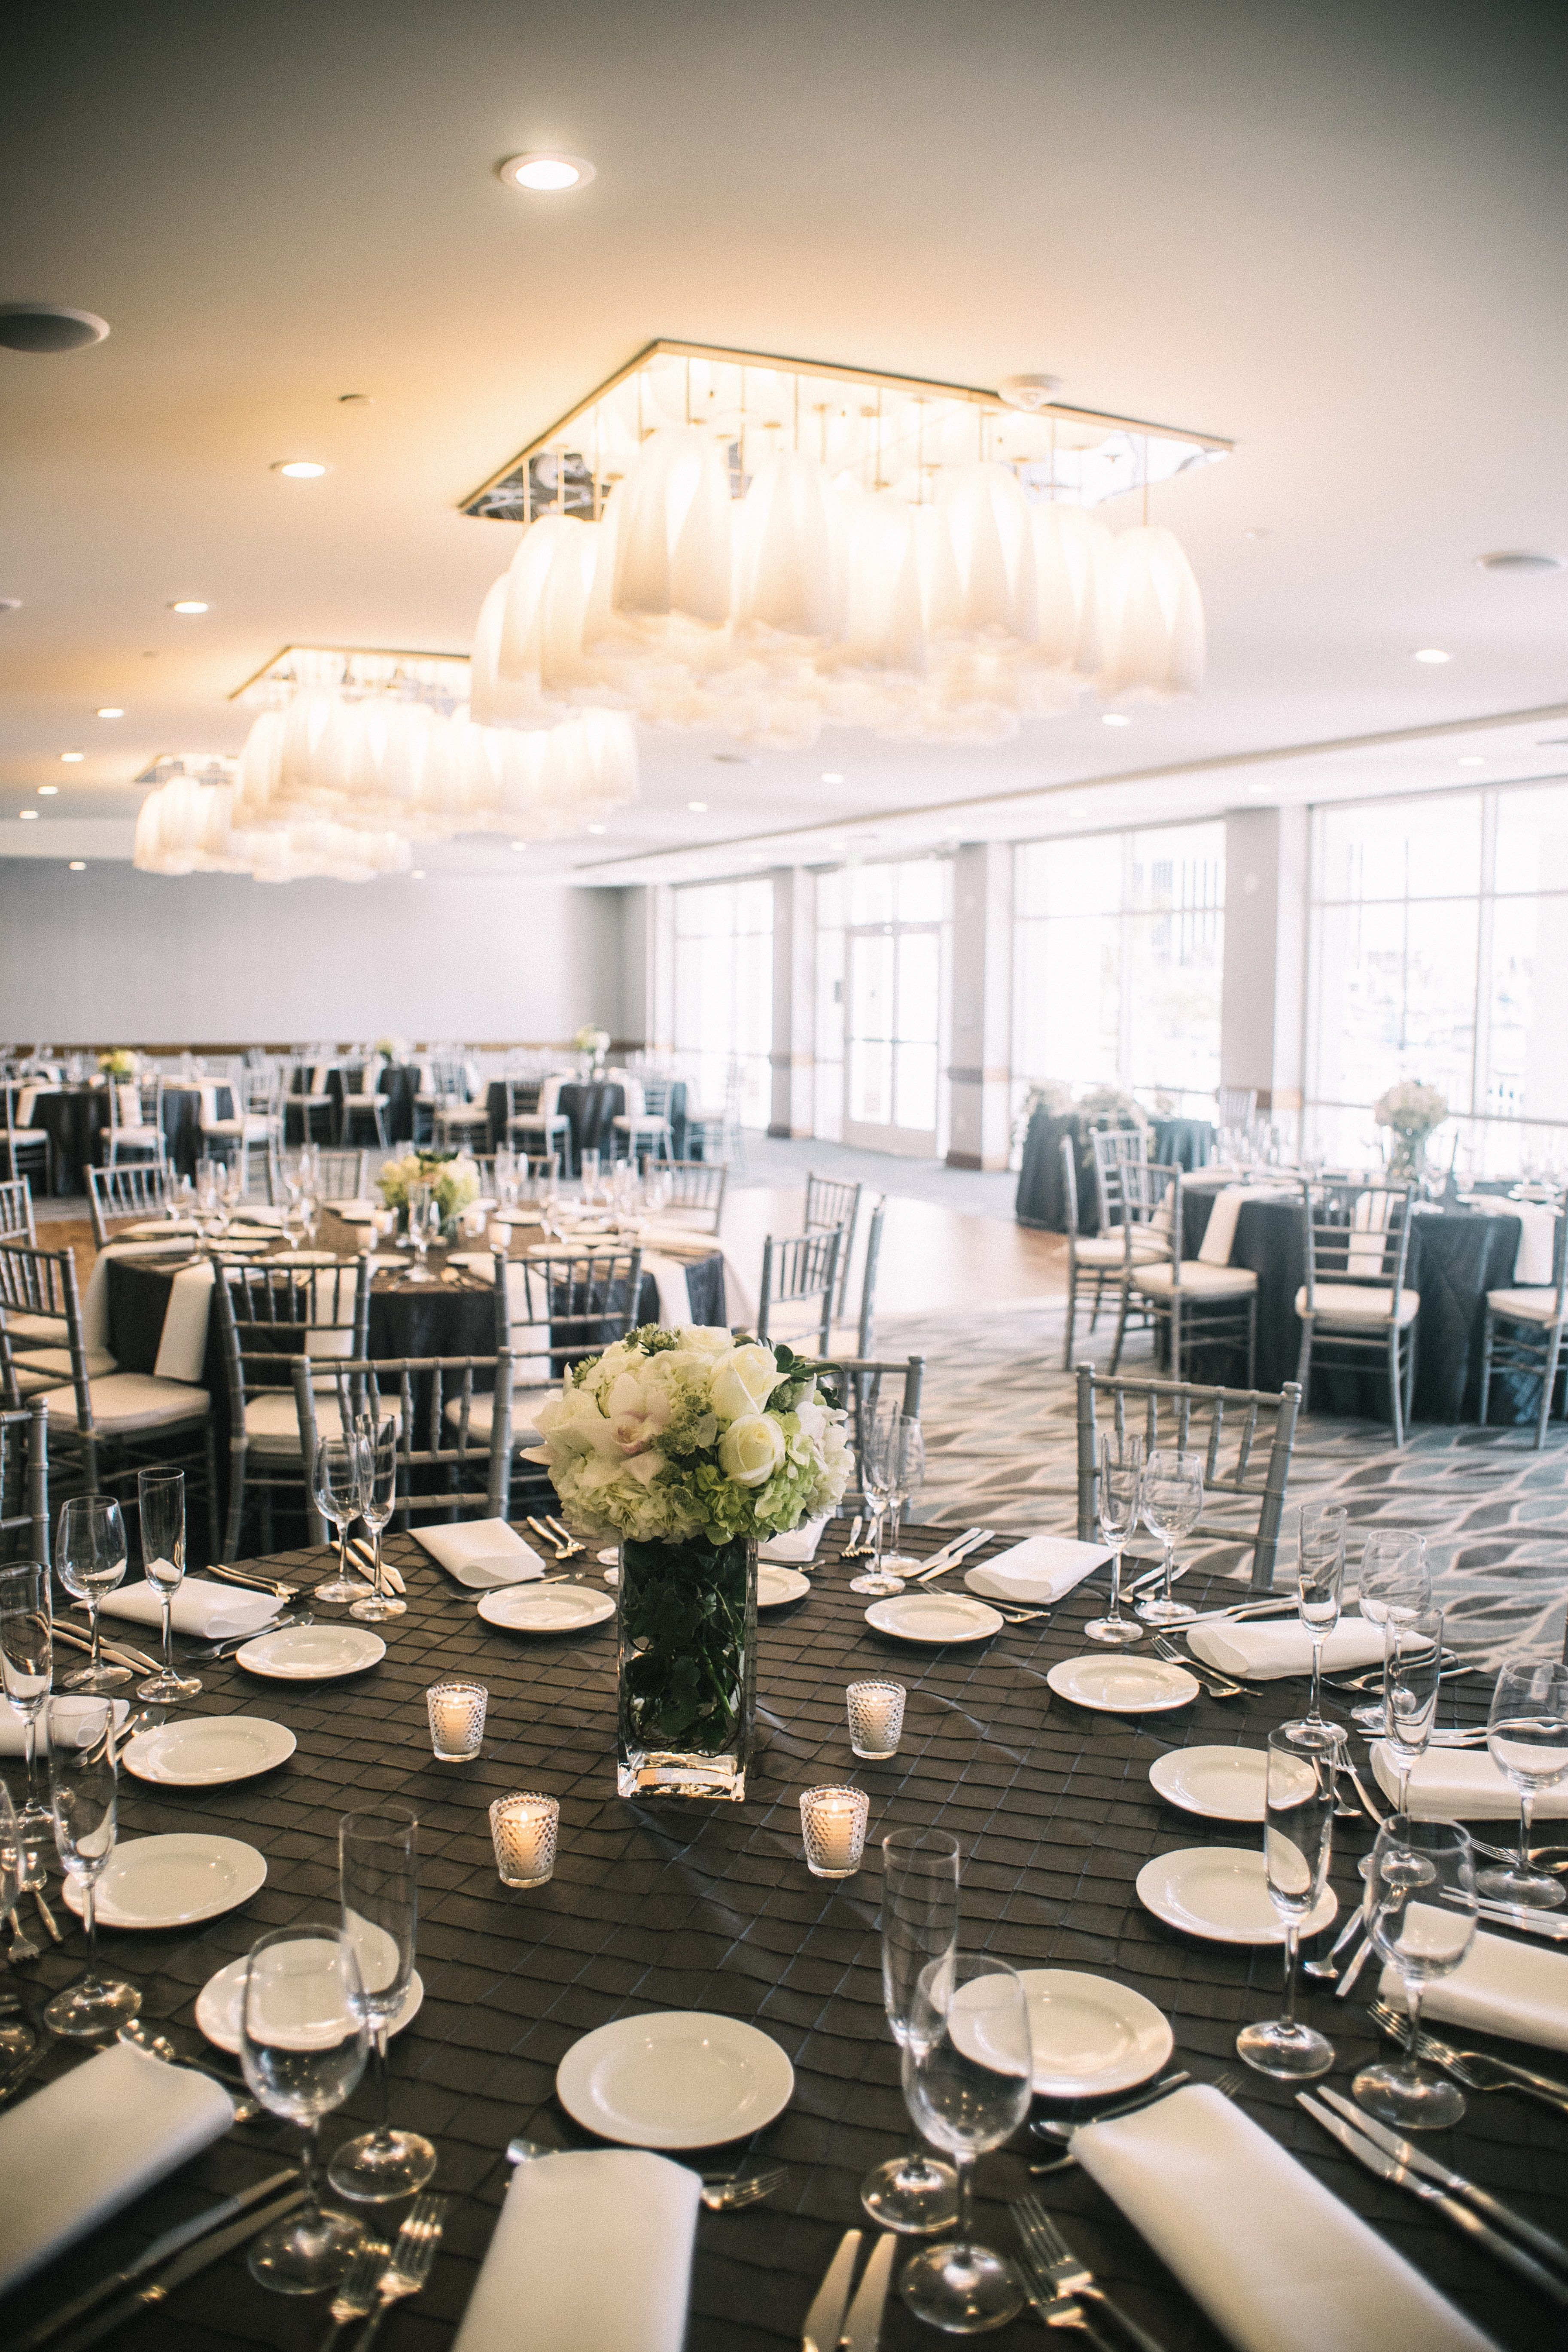 Grey And White Wedding Reception In The Regatta Ballroom At Marina Del Rey Hotel: Grey White Wedding Venues At Websimilar.org